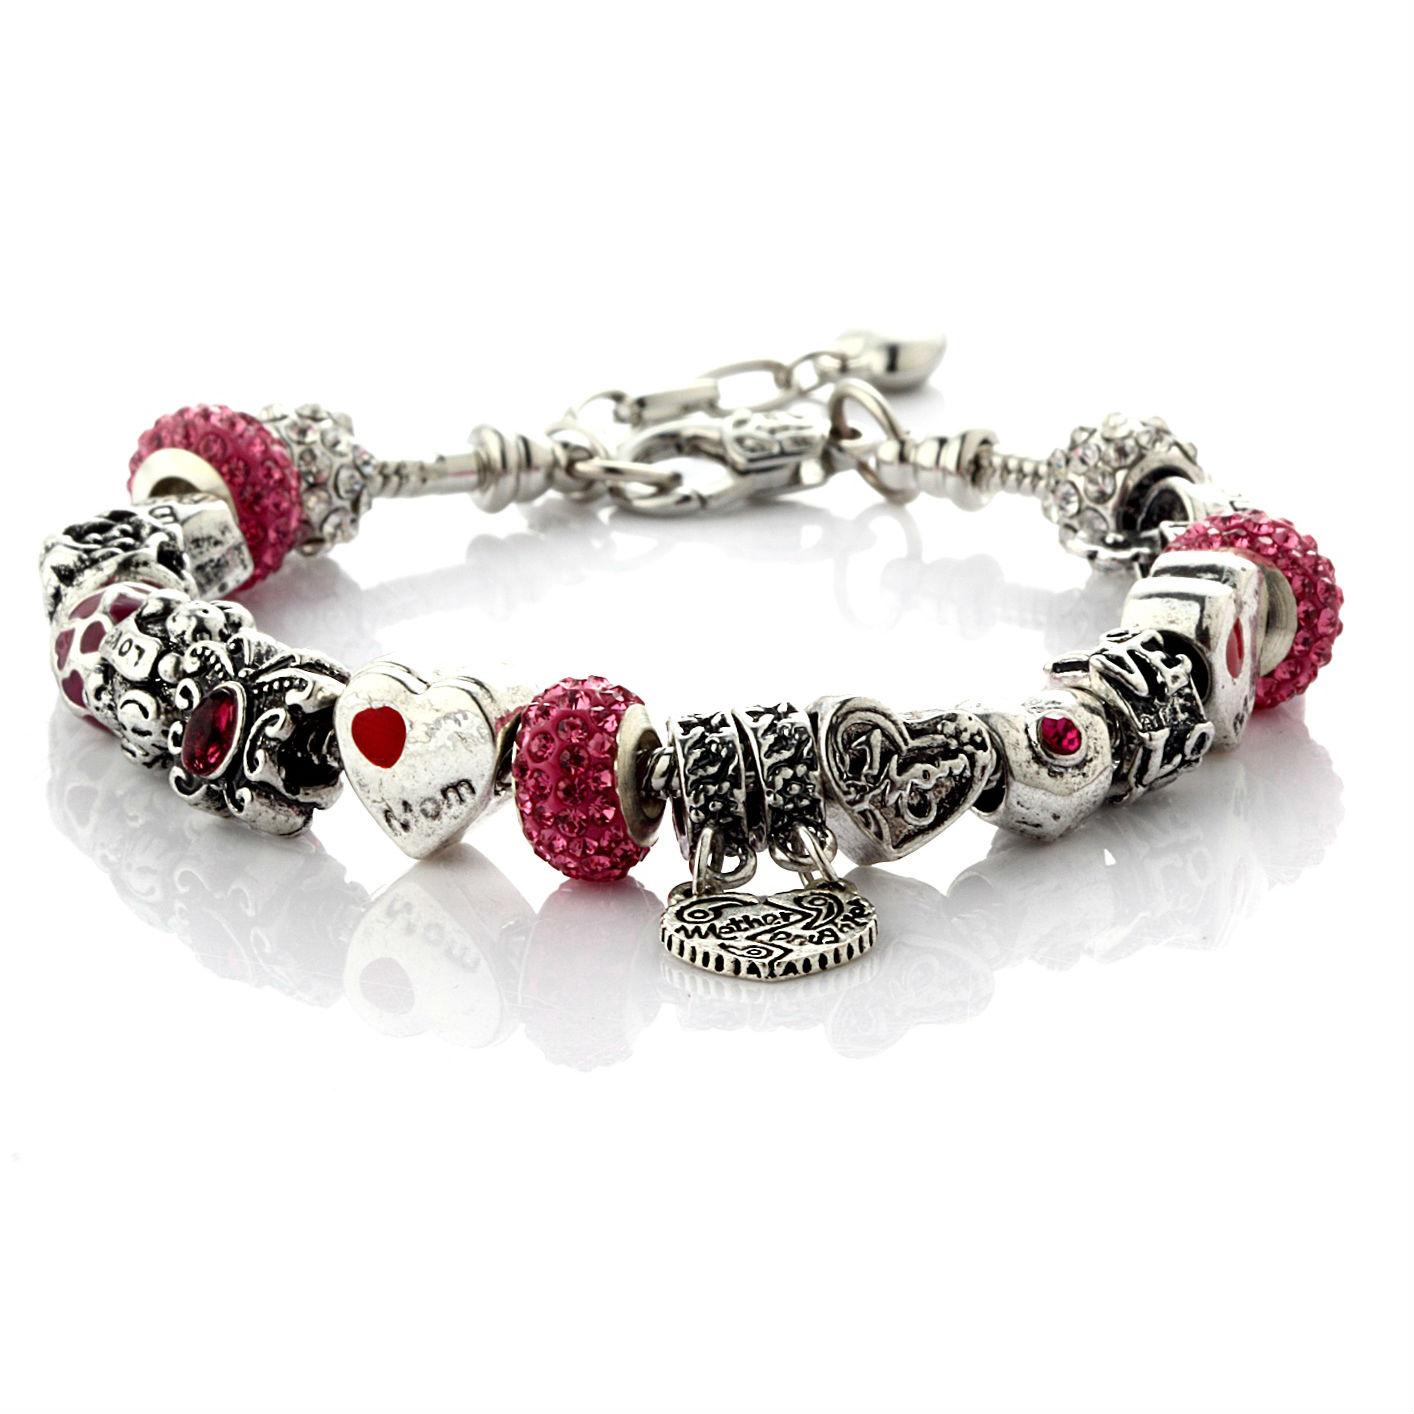 Mother Daughter Love Charm Bracelet